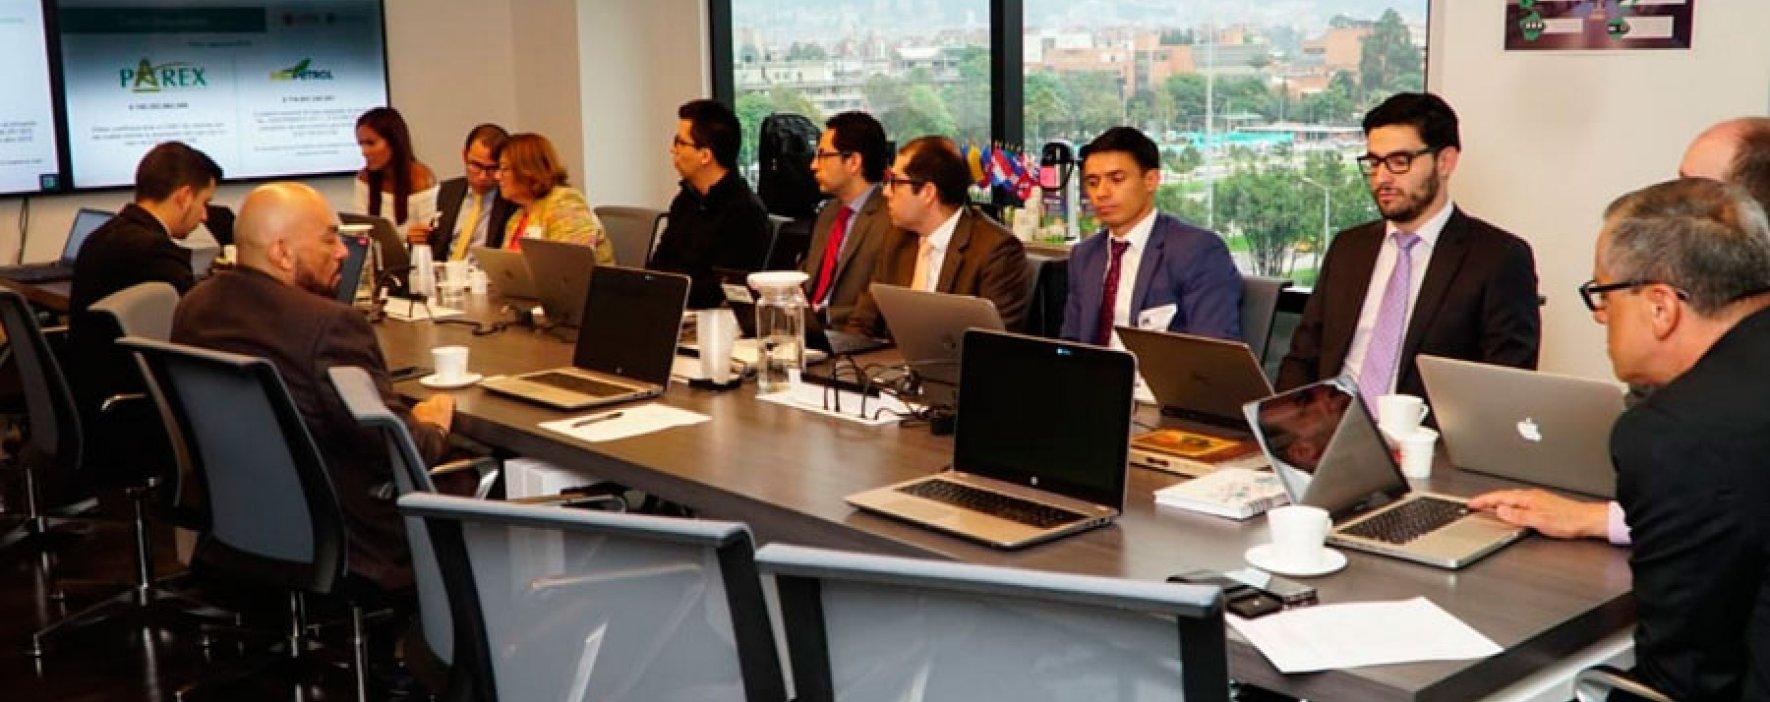 Gobierno aumentó cupo en beneficios tributarios e invita a empresarios del país a innovar